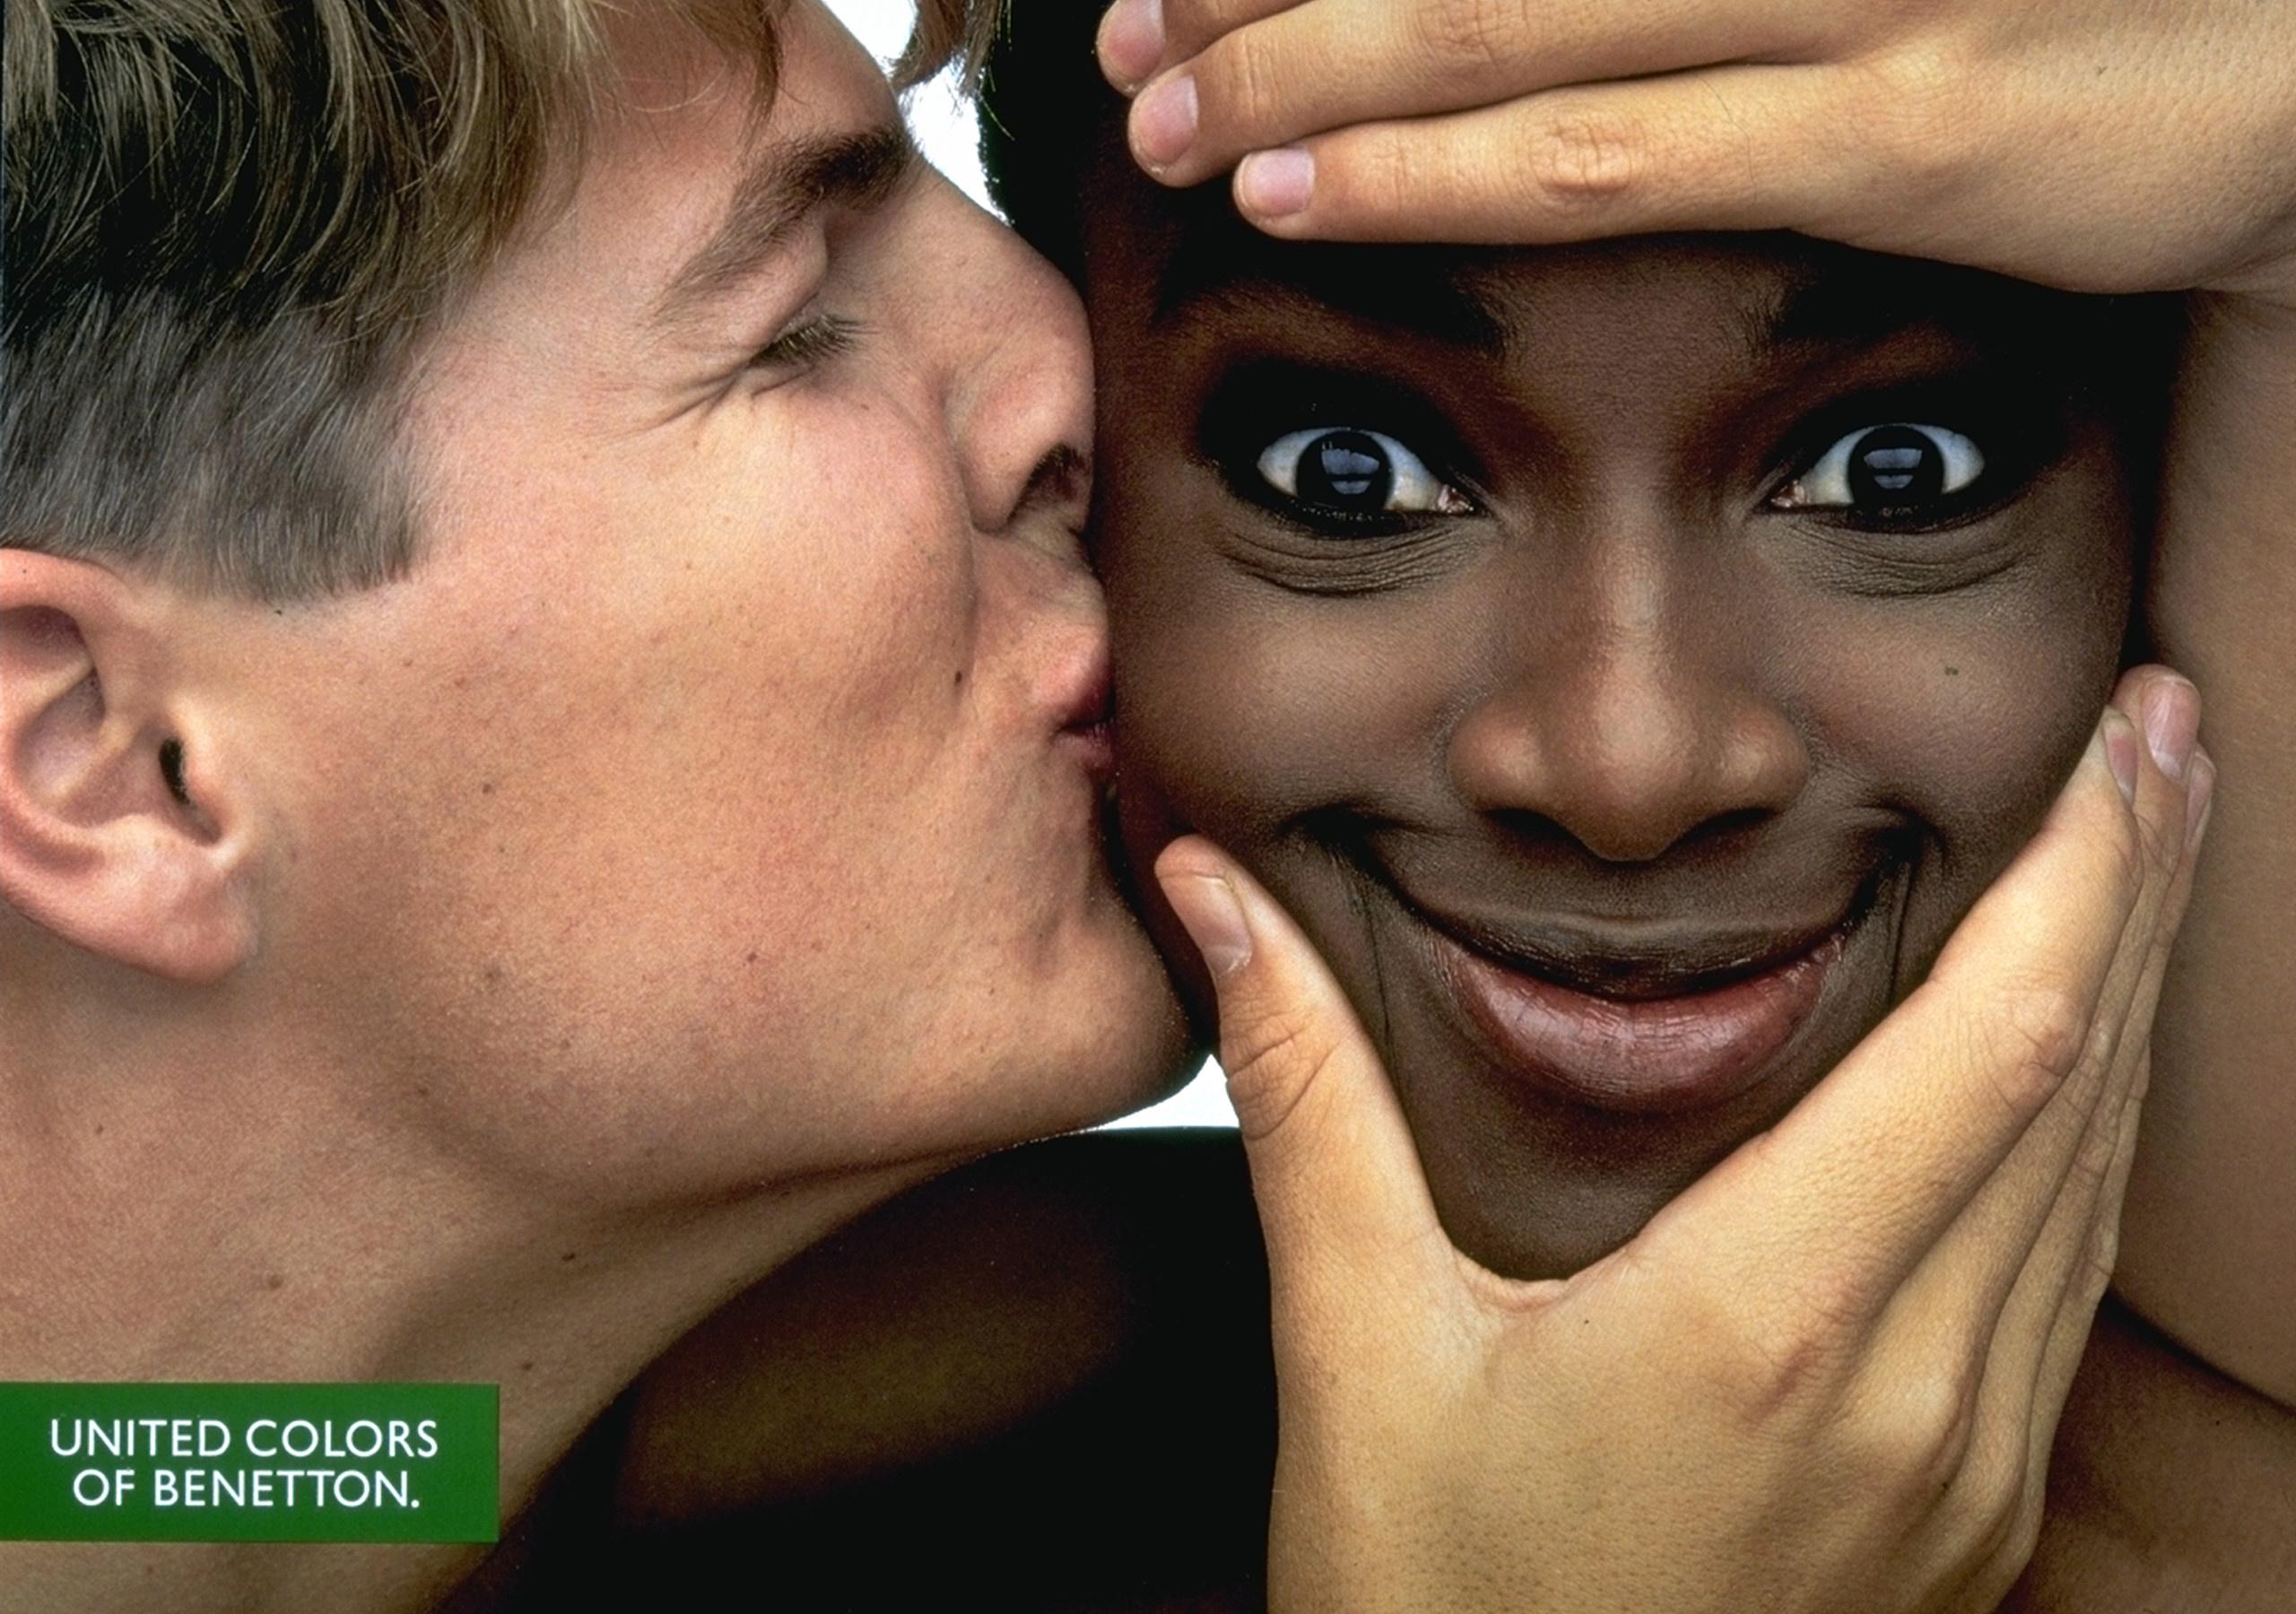 Фото негритя с белыми парнями 14 фотография